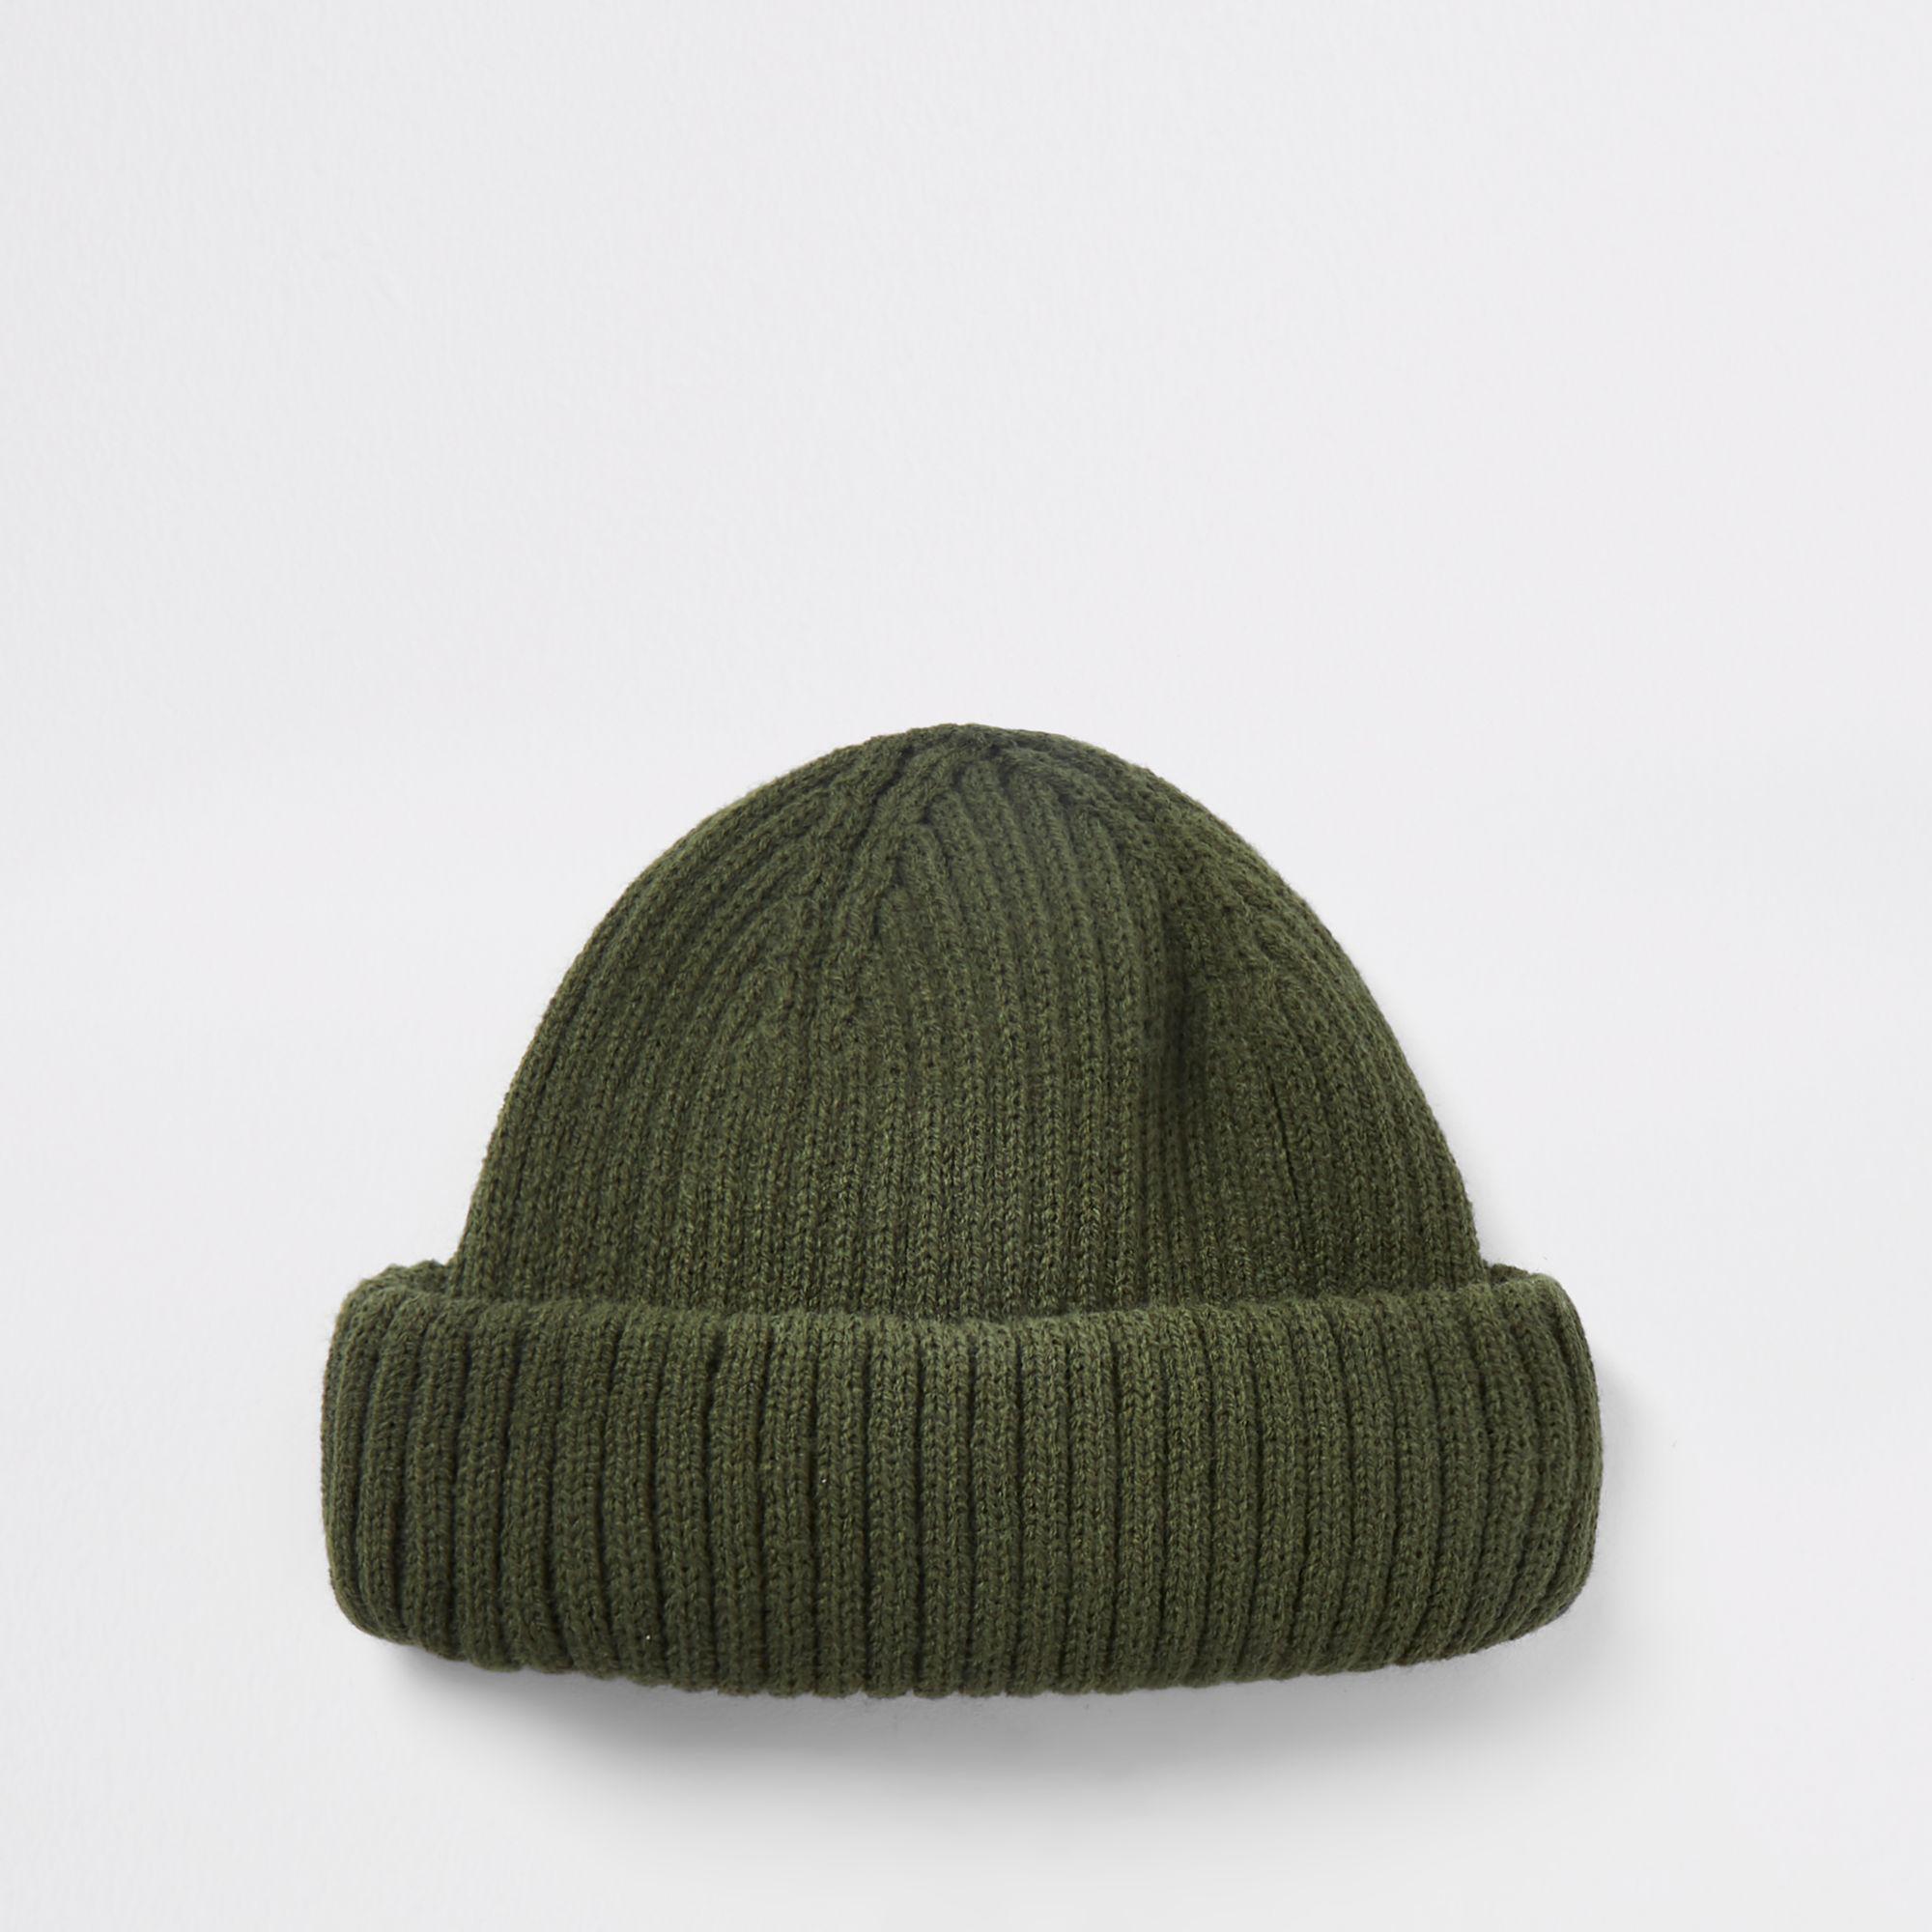 9c762cceae0 River Island Khaki Green Mini Fisherman Beanie Hat in Green for Men ...